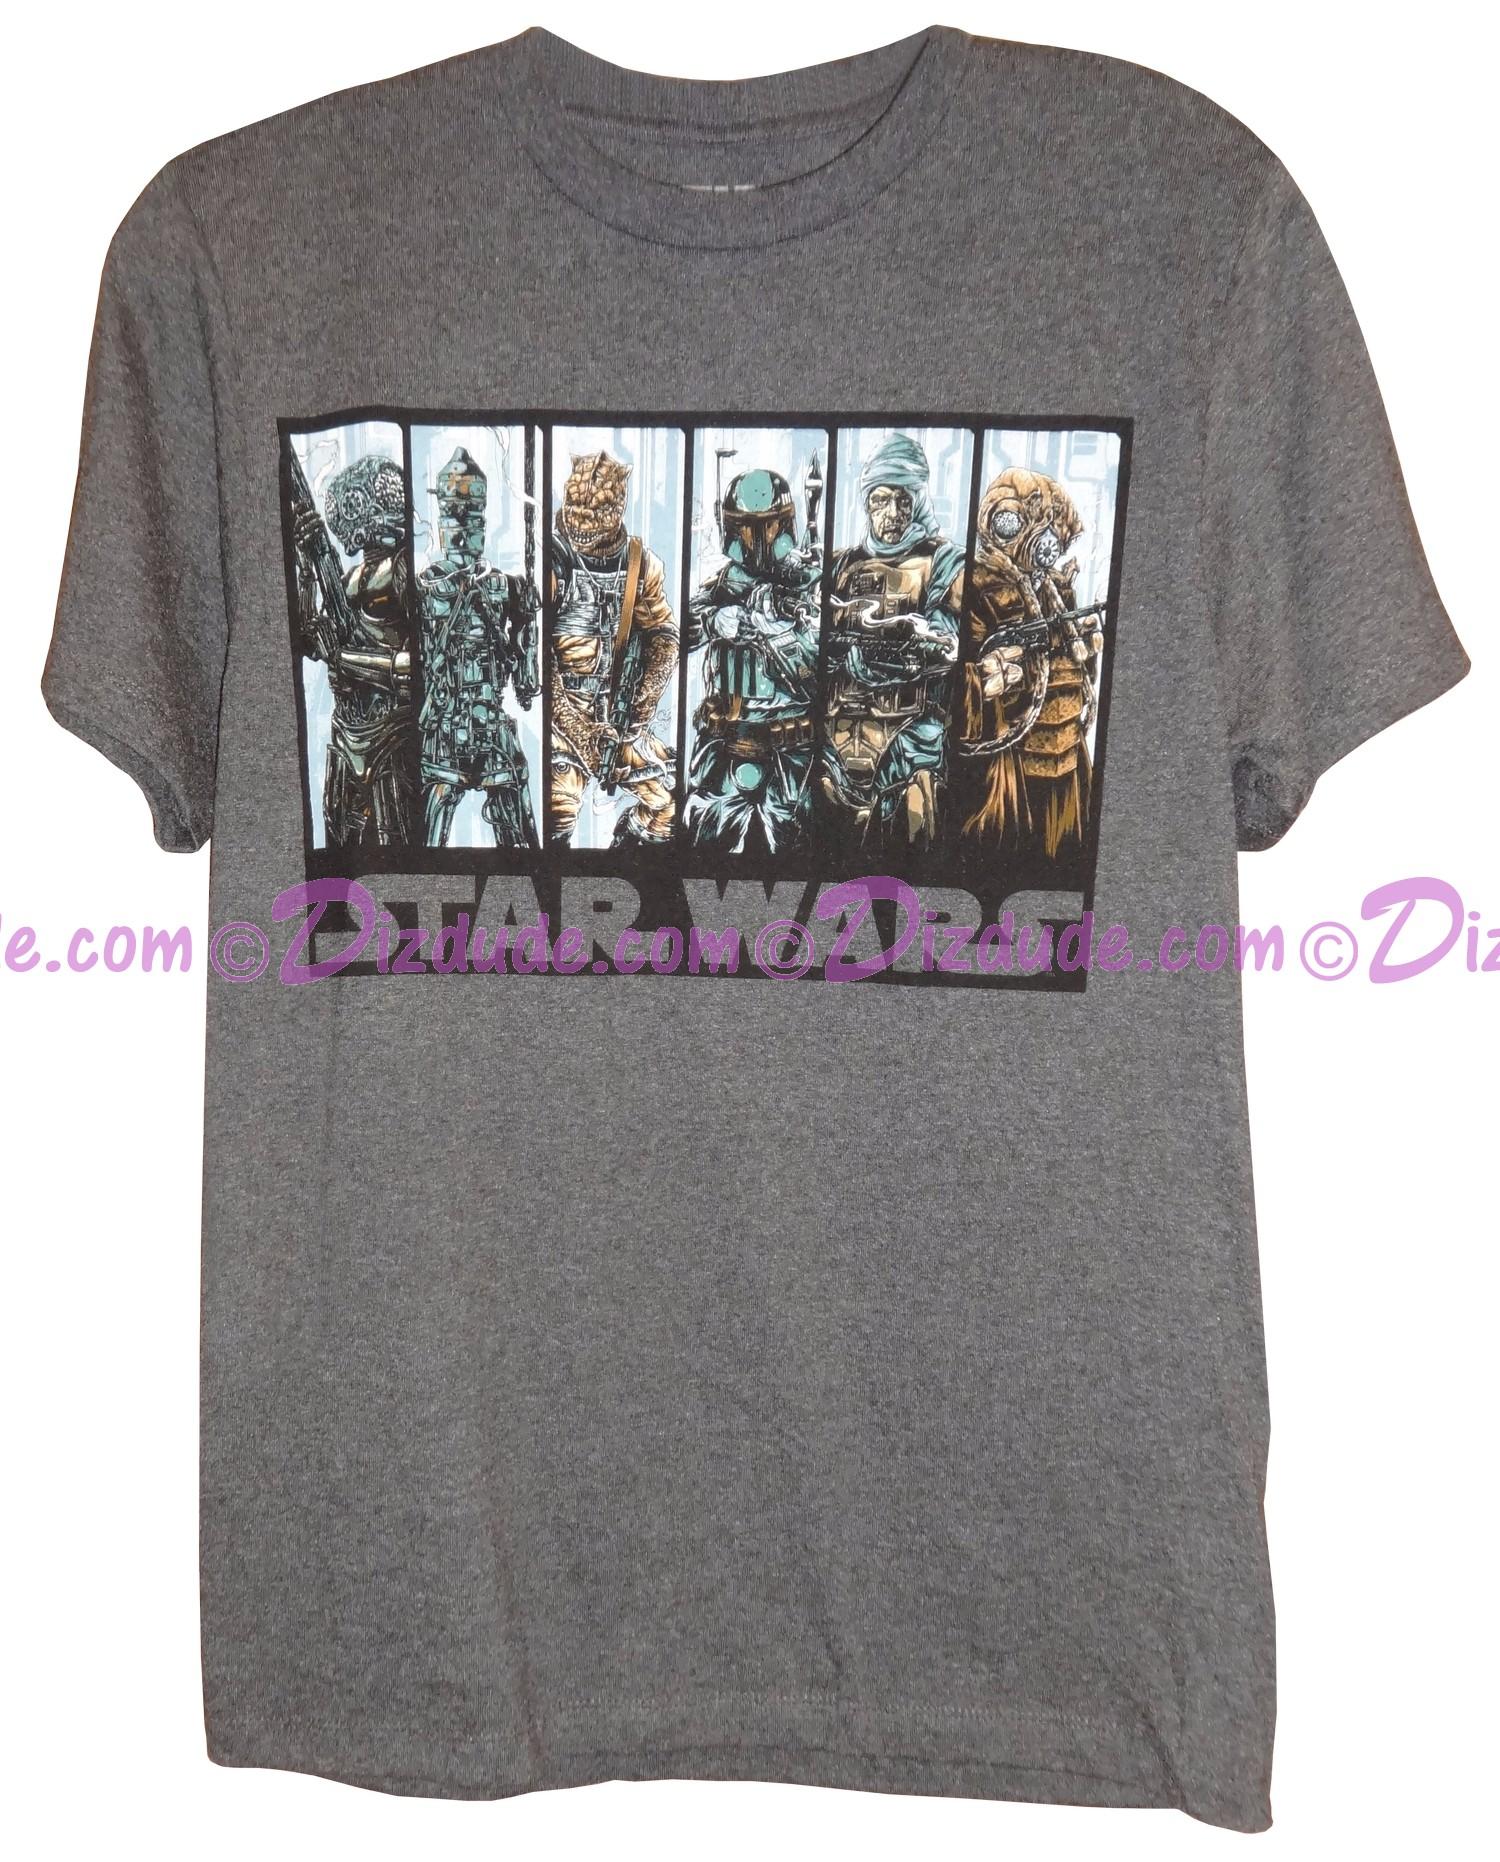 Bounty Hunters Adult T-Shirt (Tshirt, T shirt or Tee) - Disney Star Wars © Dizdude.com